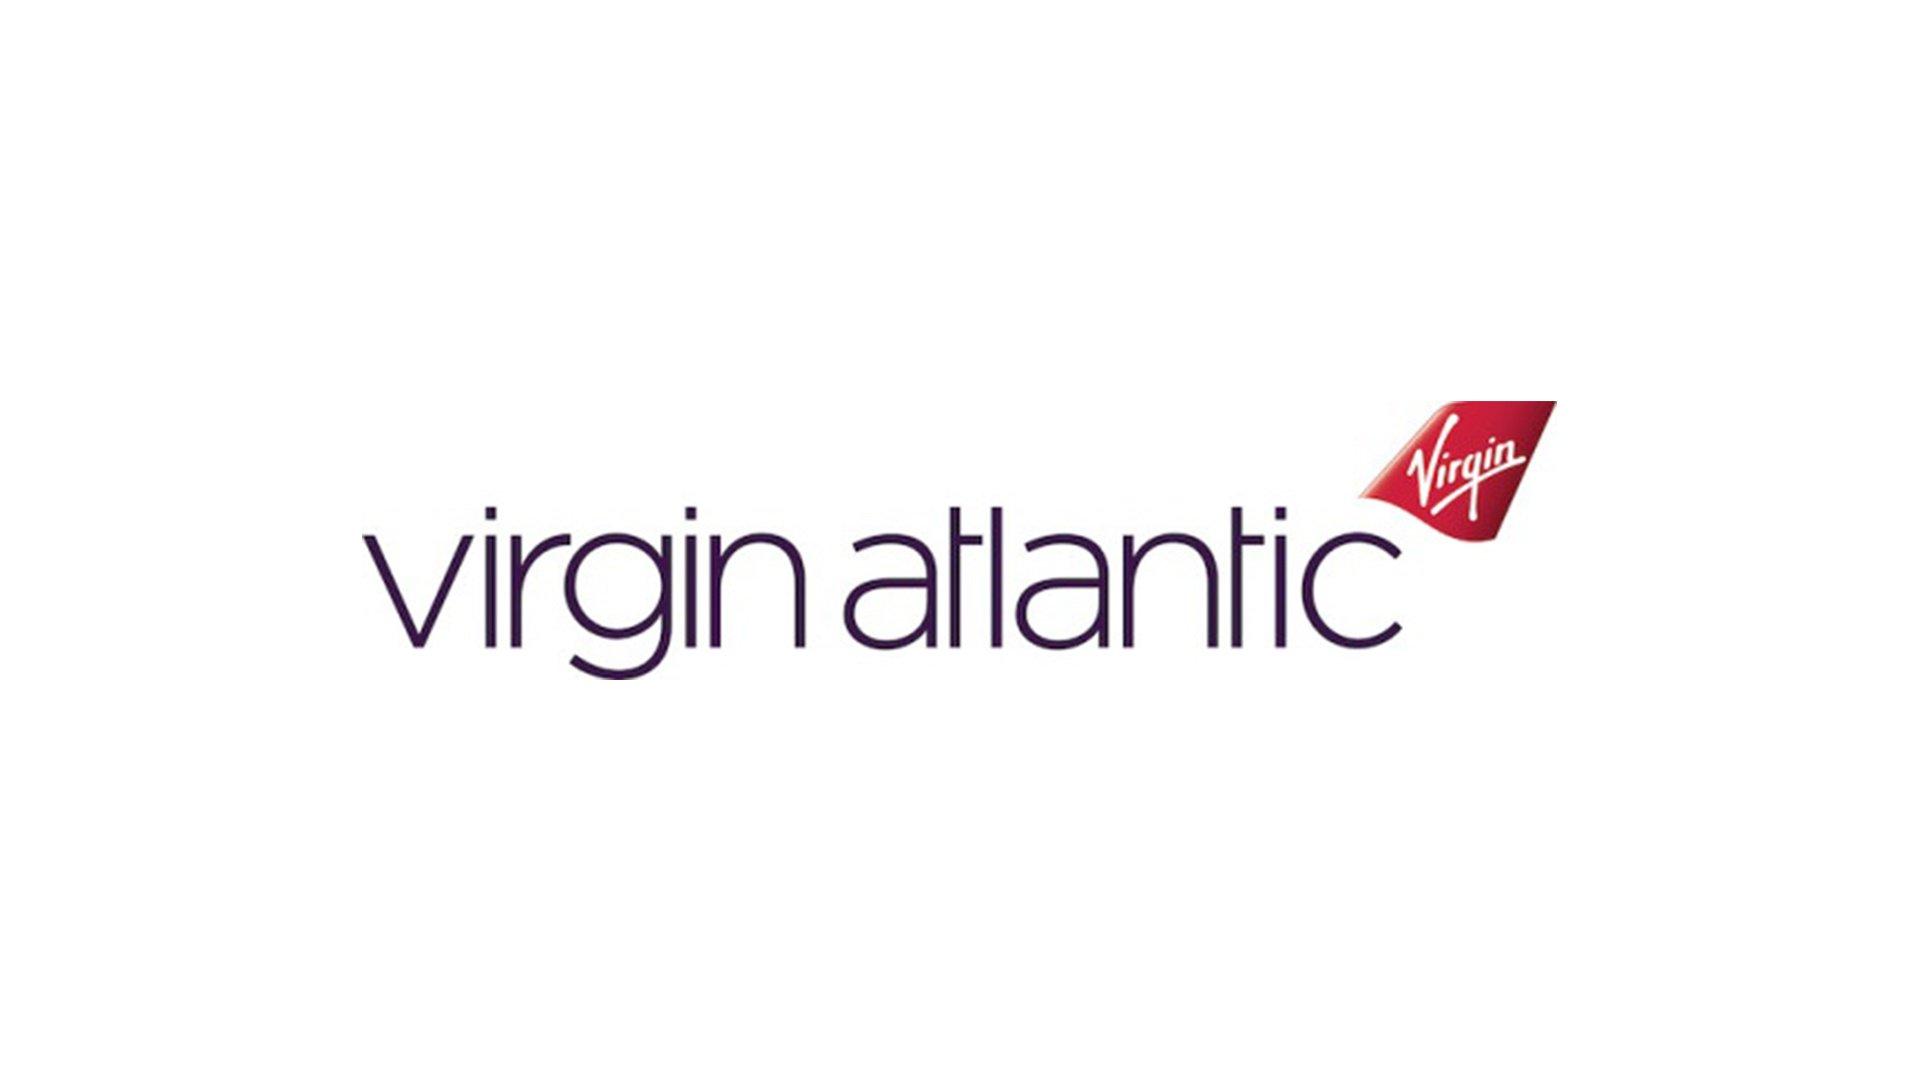 Content Marketing All-Stars Q&A: Claire Cronin of Virgin Atlantic